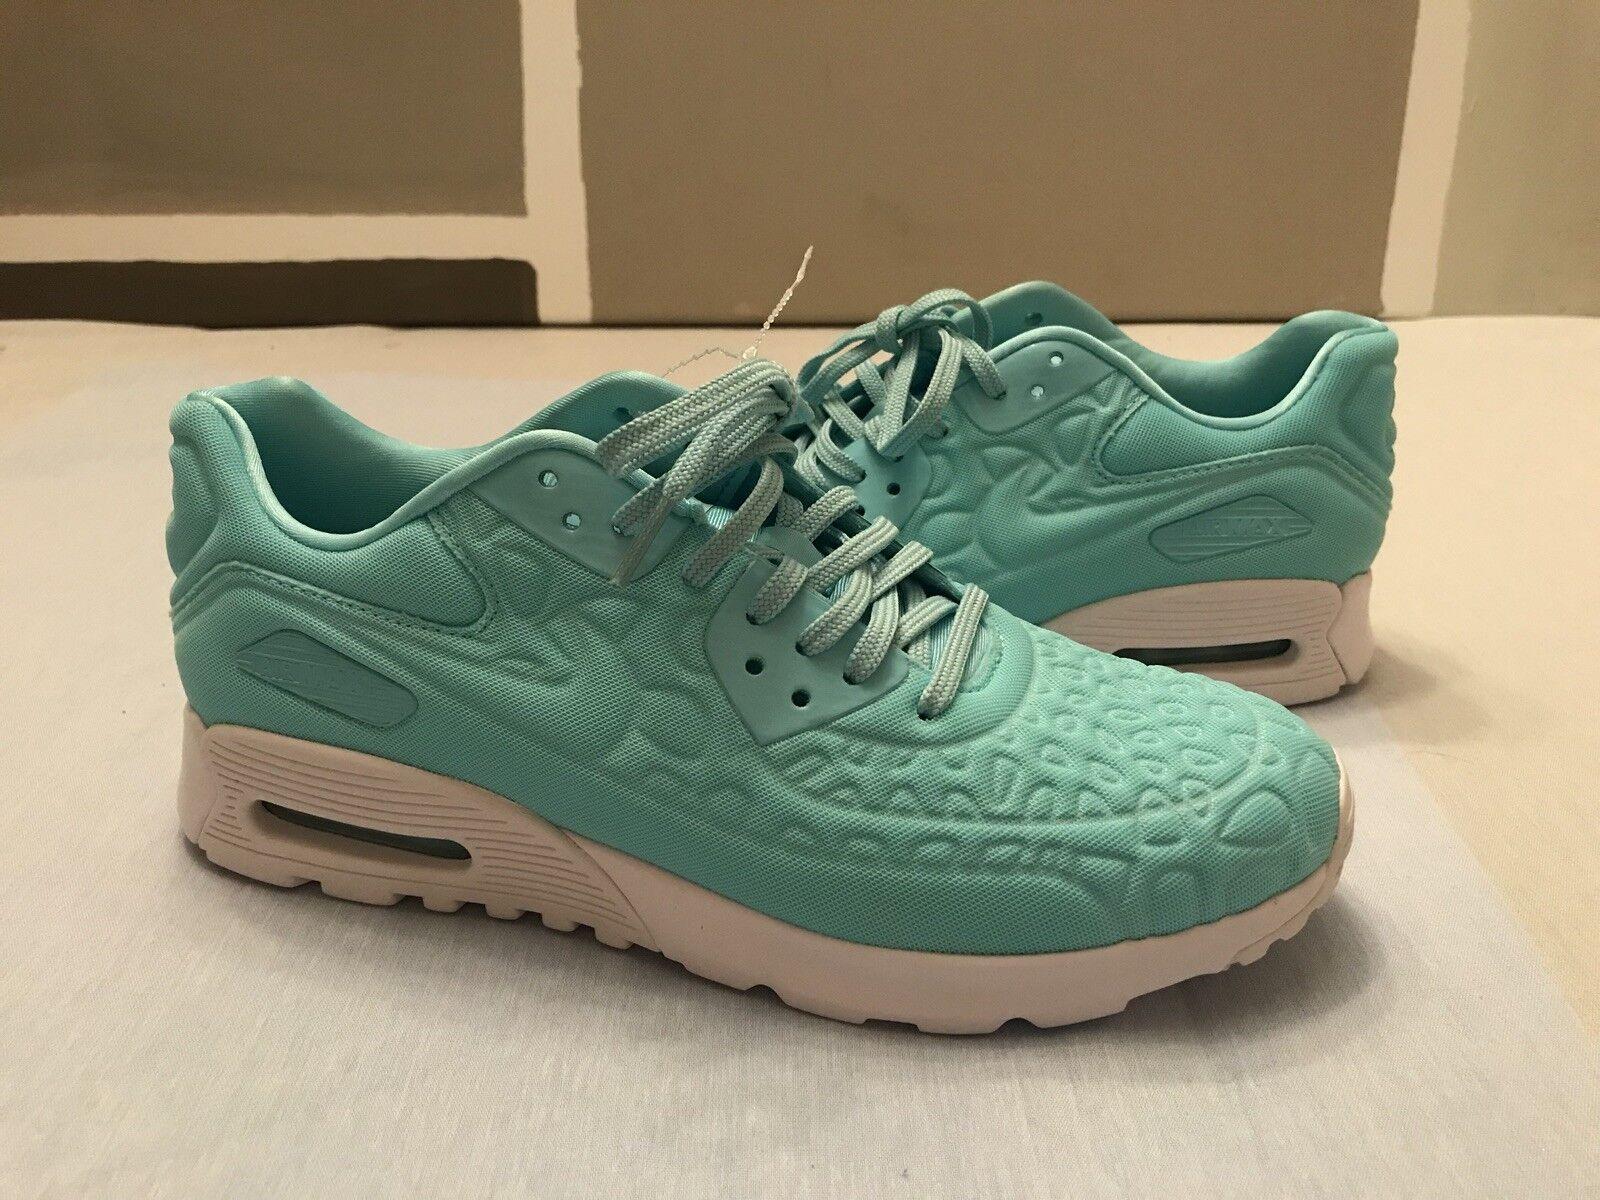 Nike air max 90 ultra soffice donne blu copa (844886-400) semplicemente favolosa!